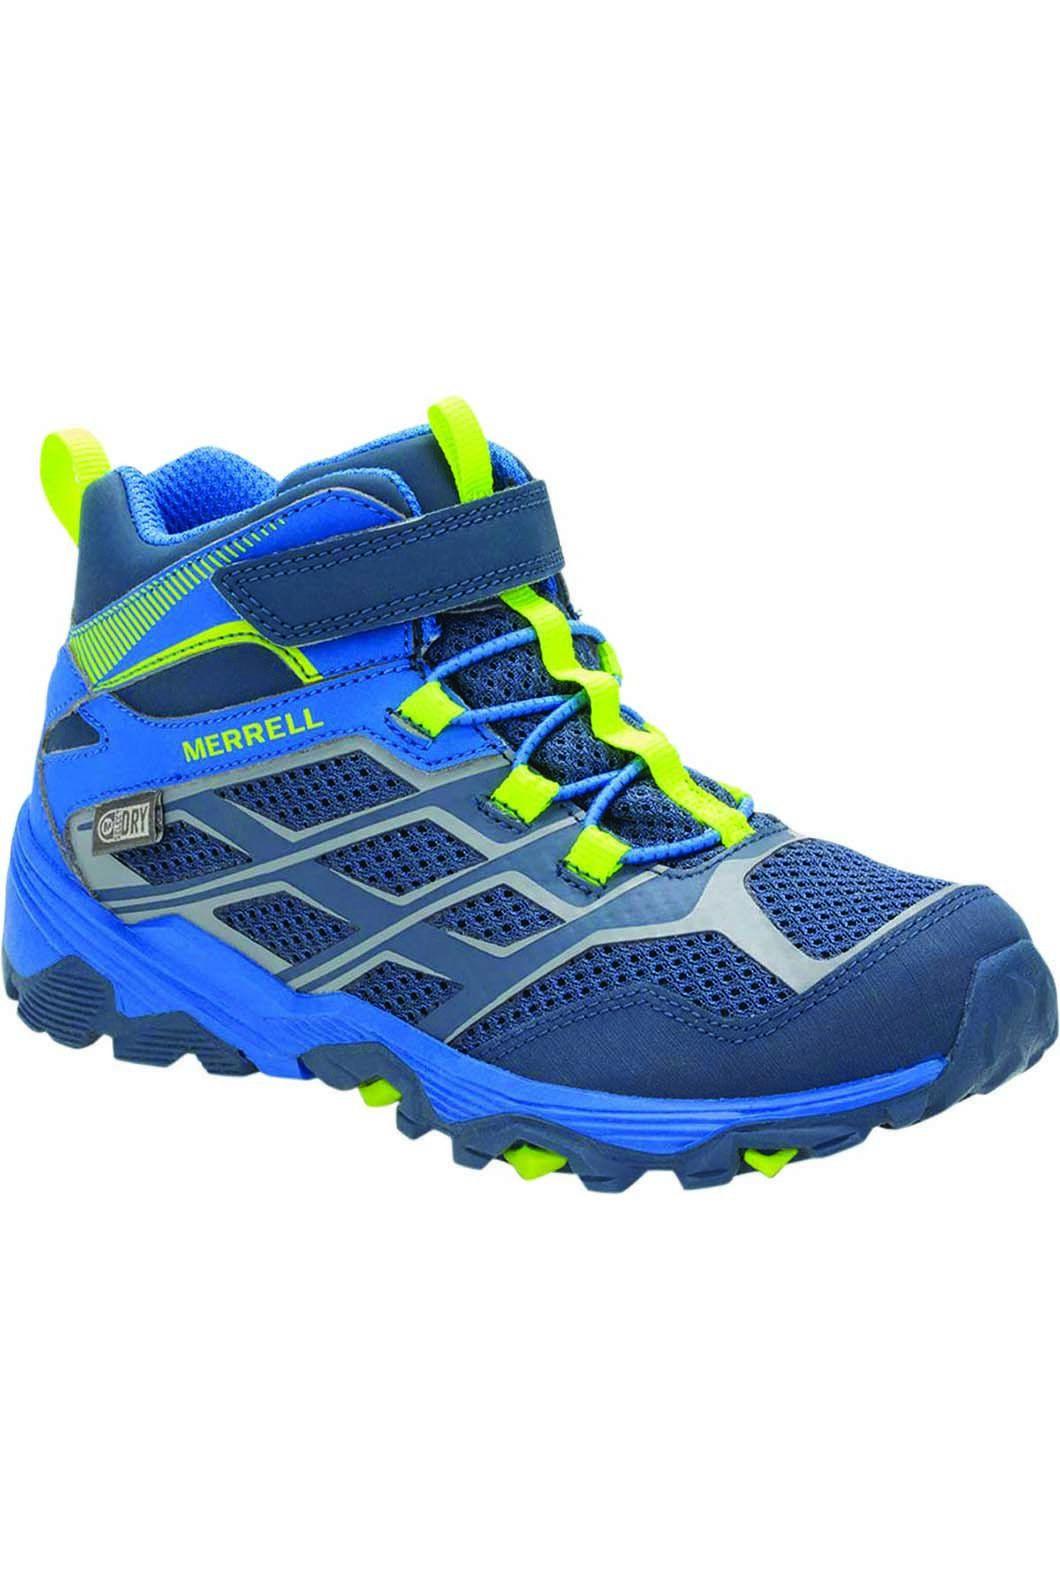 Merrell Kids' Moab FST Mid WP Hiking Boots, NAVY/COBALT, hi-res